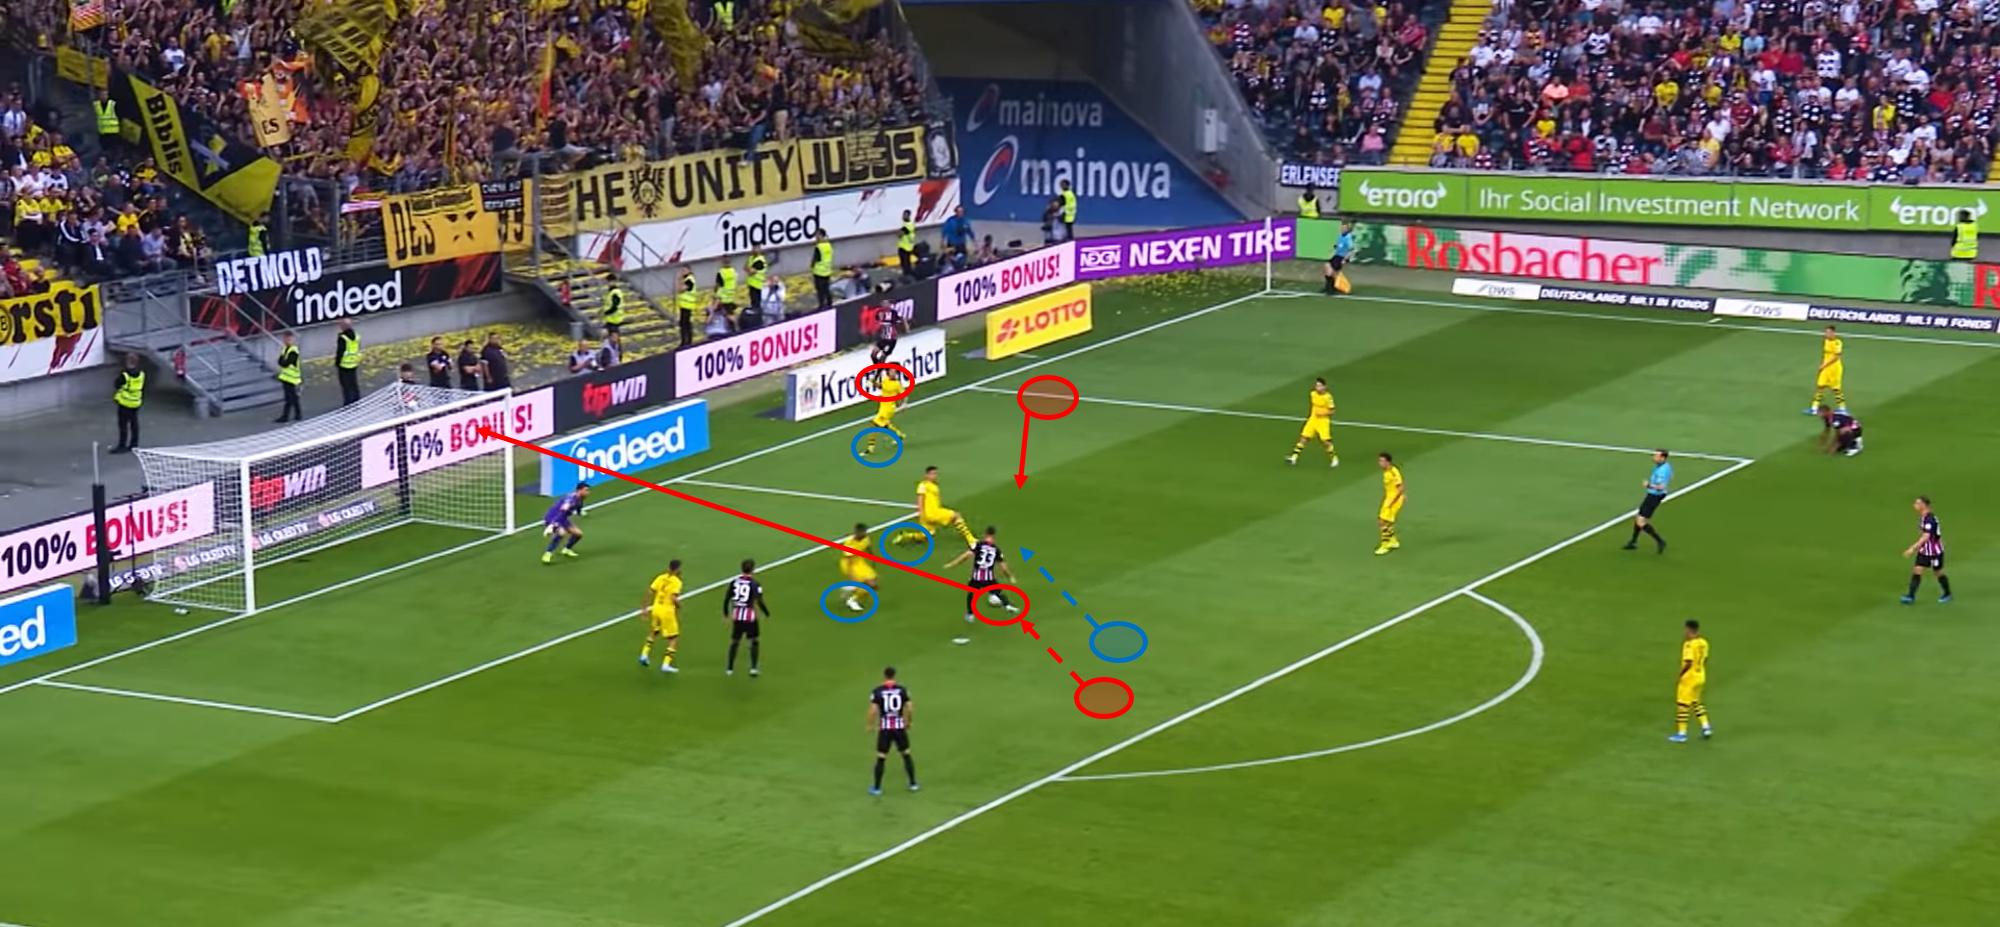 André Silva 2019/20 – Did Frankfurt get the better deal? – scout report - tactical analysis - tactics